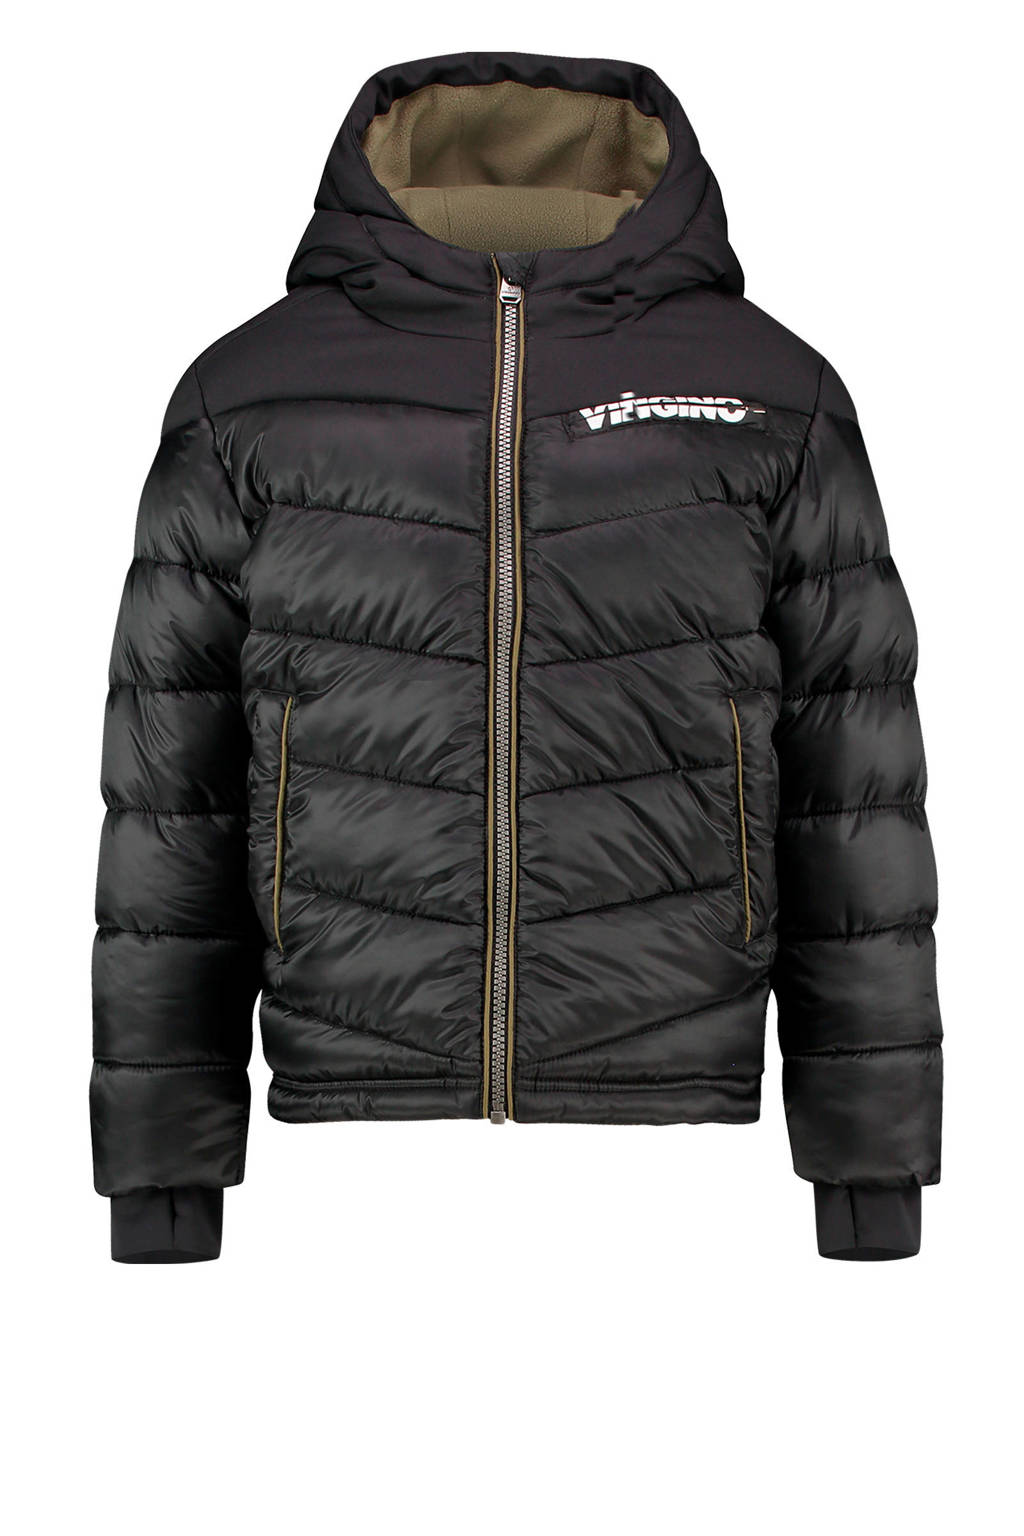 Vingino gewatteerde winterjas Tugra zwart, Zwart